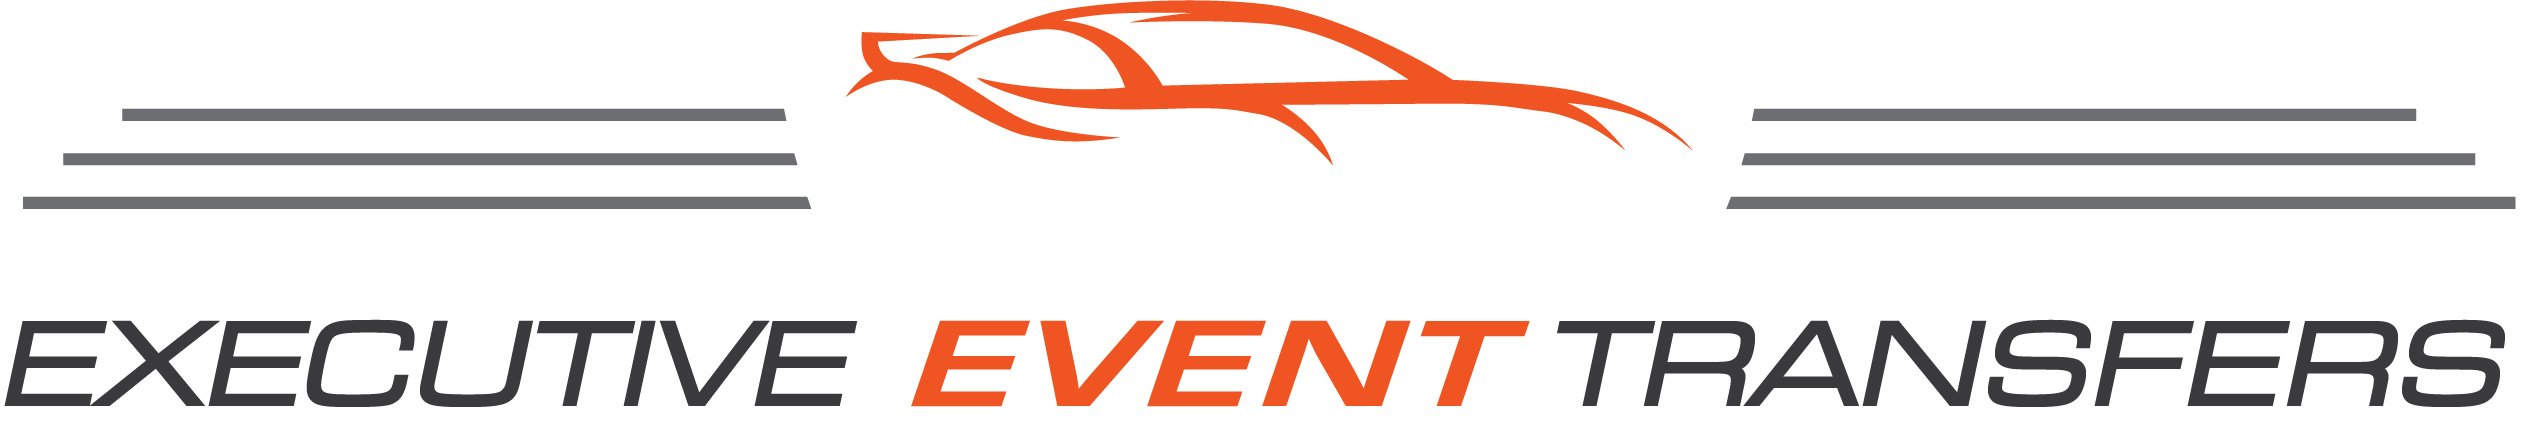 Executive Events Transfers Logo FINALS